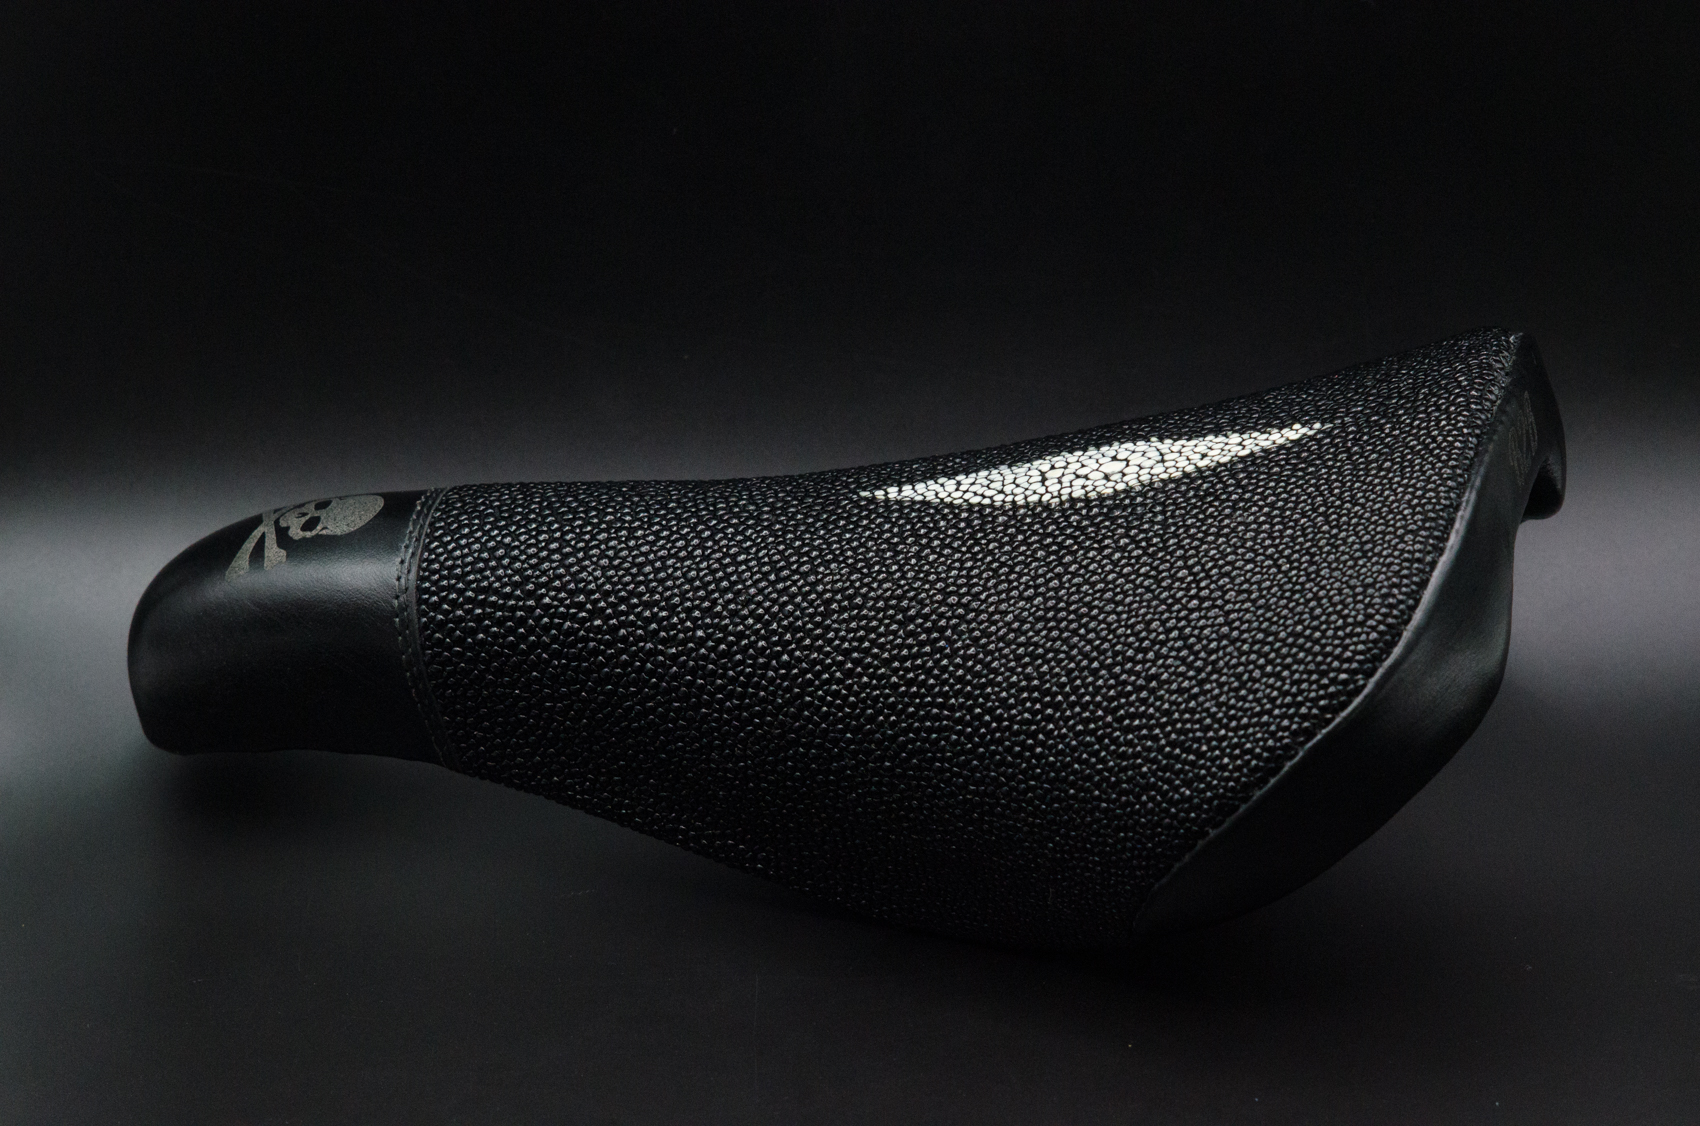 Leh cycling goods leather stingray saddle custom black skull and cross bones -8.jpg